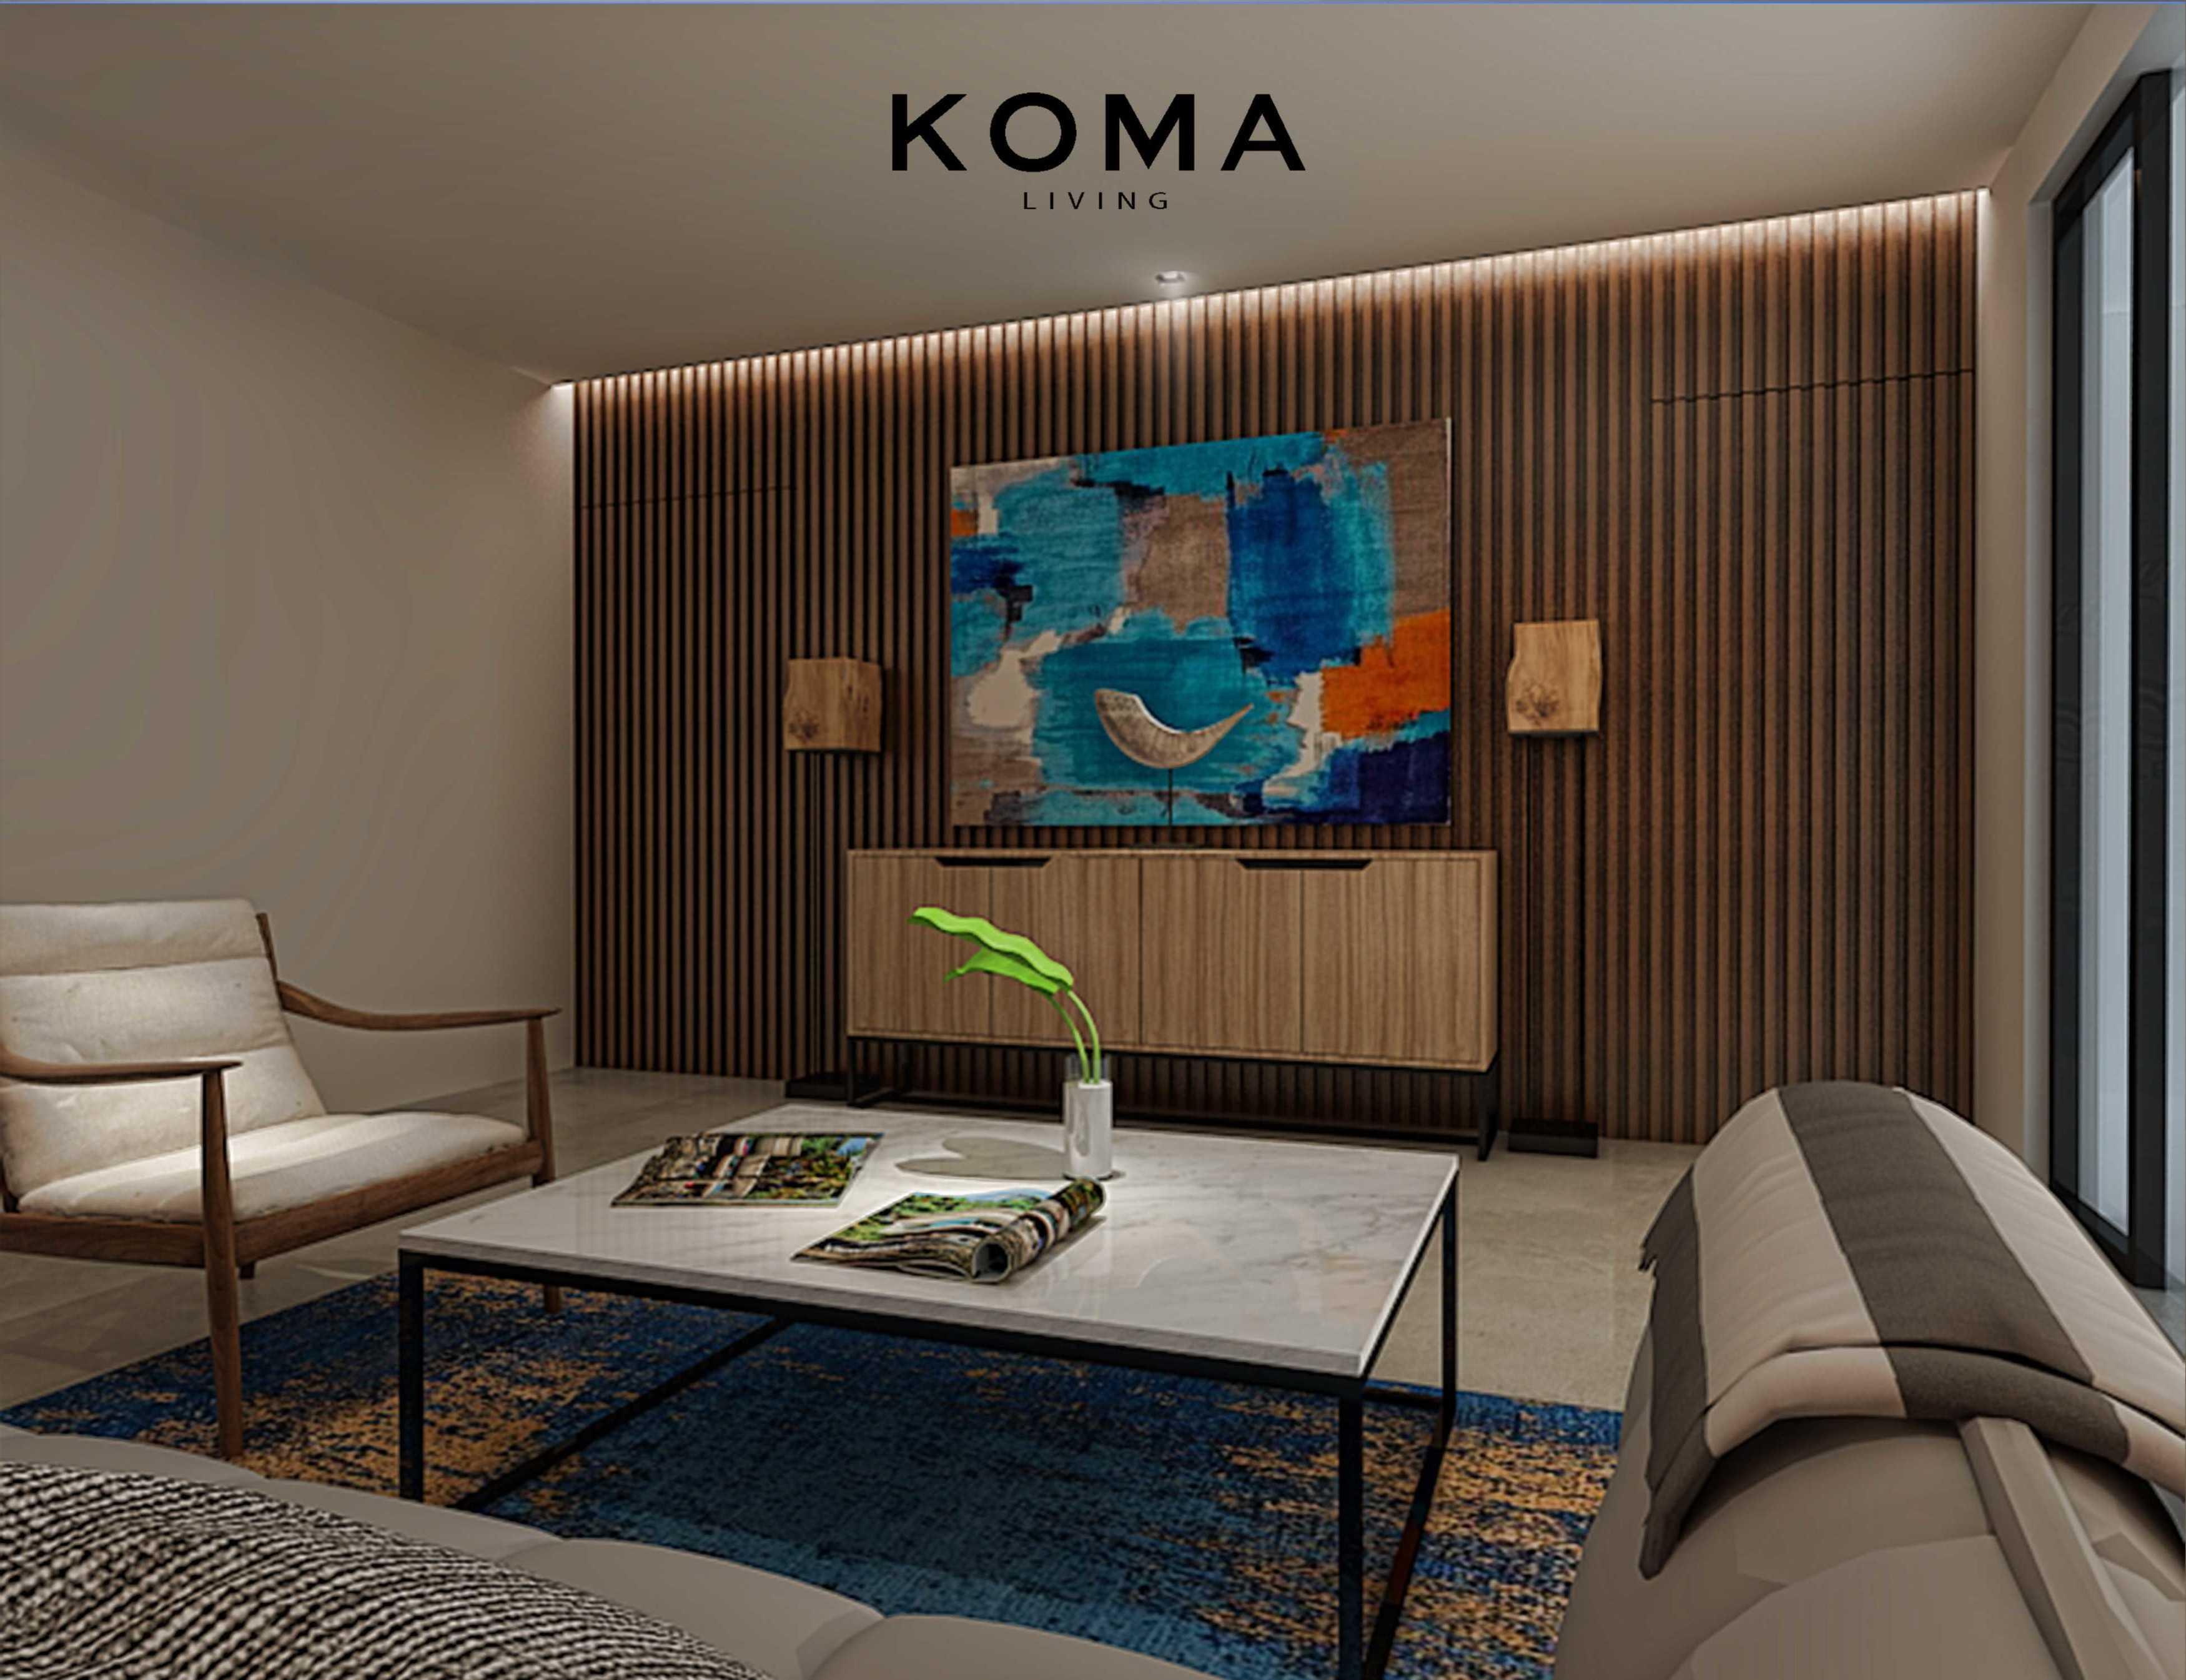 Koma Stt Office Papua, Indonesia Papua, Indonesia Koma-Stt-Office   70252